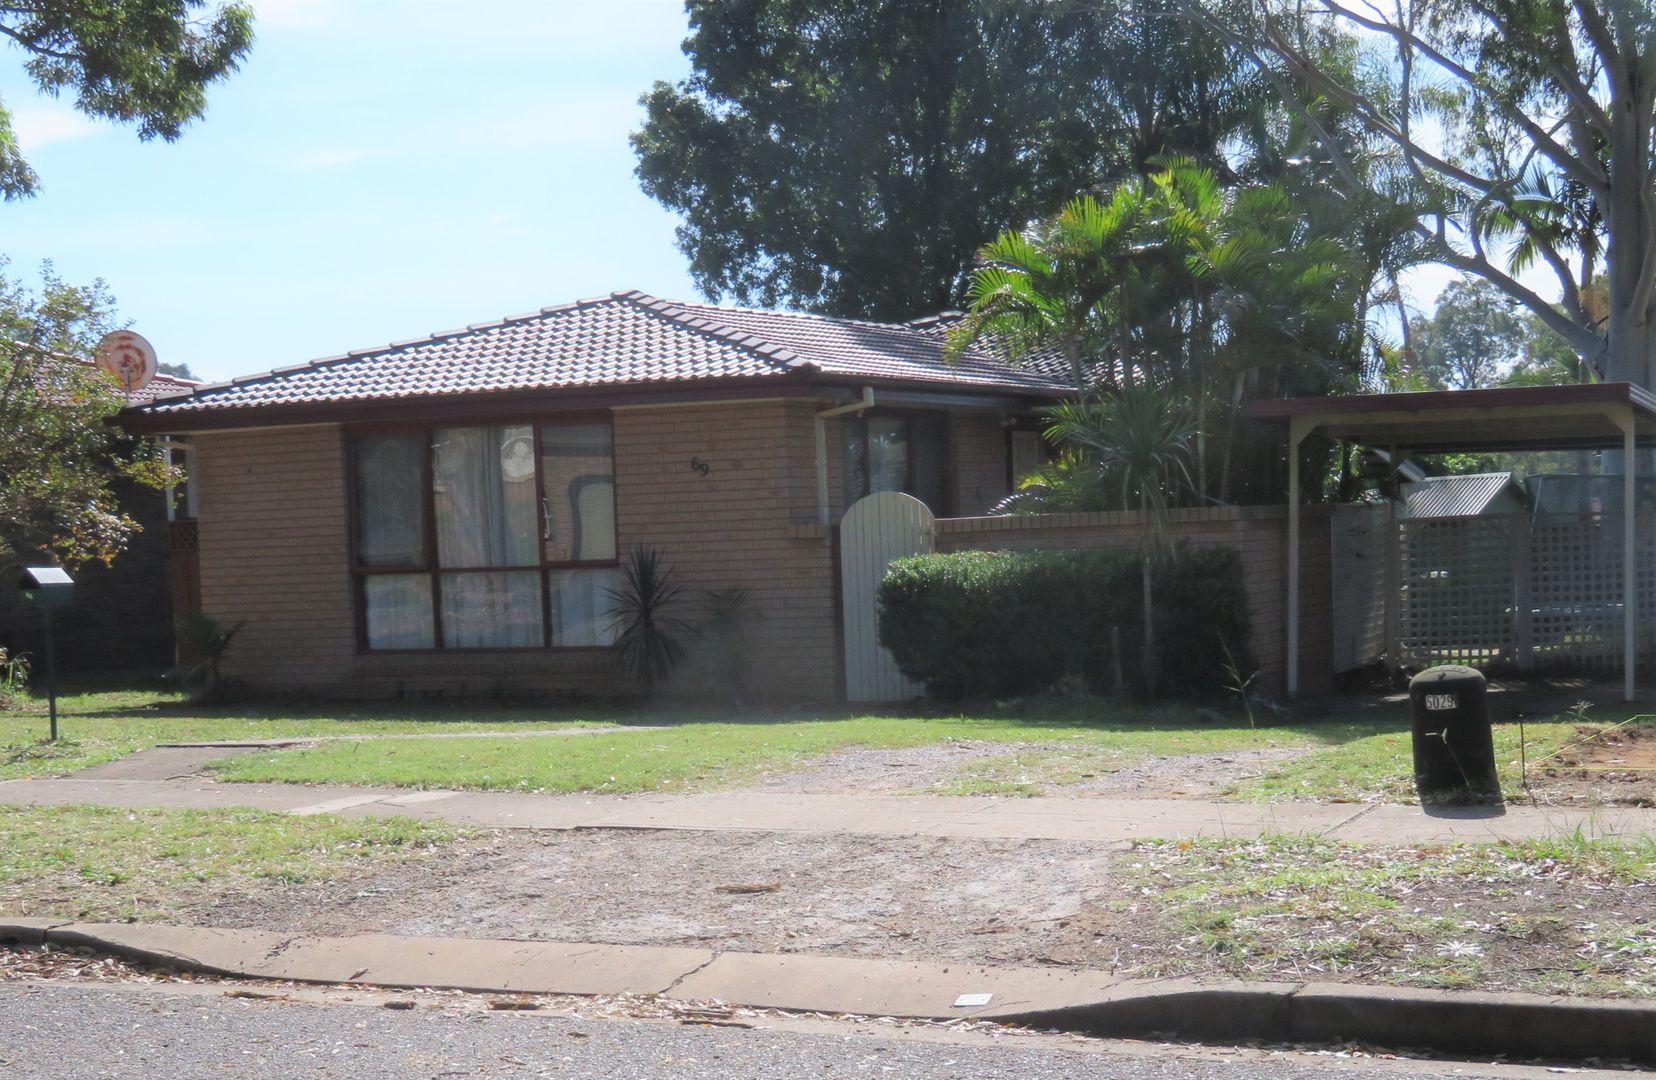 69 Narcissus Avenue, Quakers Hill NSW 2763, Image 0